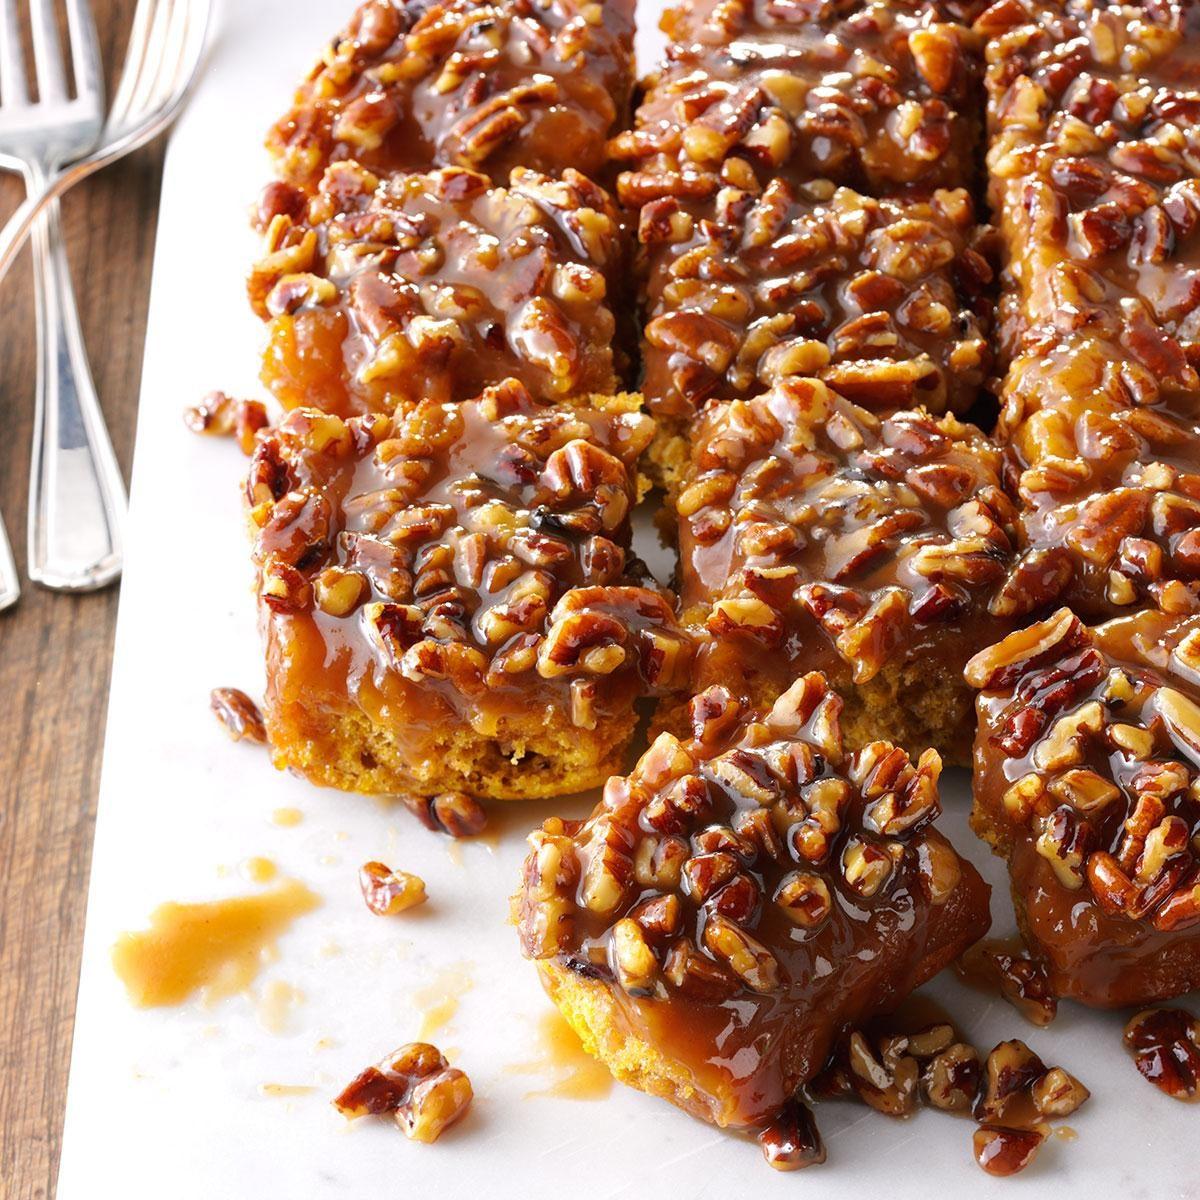 Caramel-Pecan Pumpkin Pull-Aparts Recipe